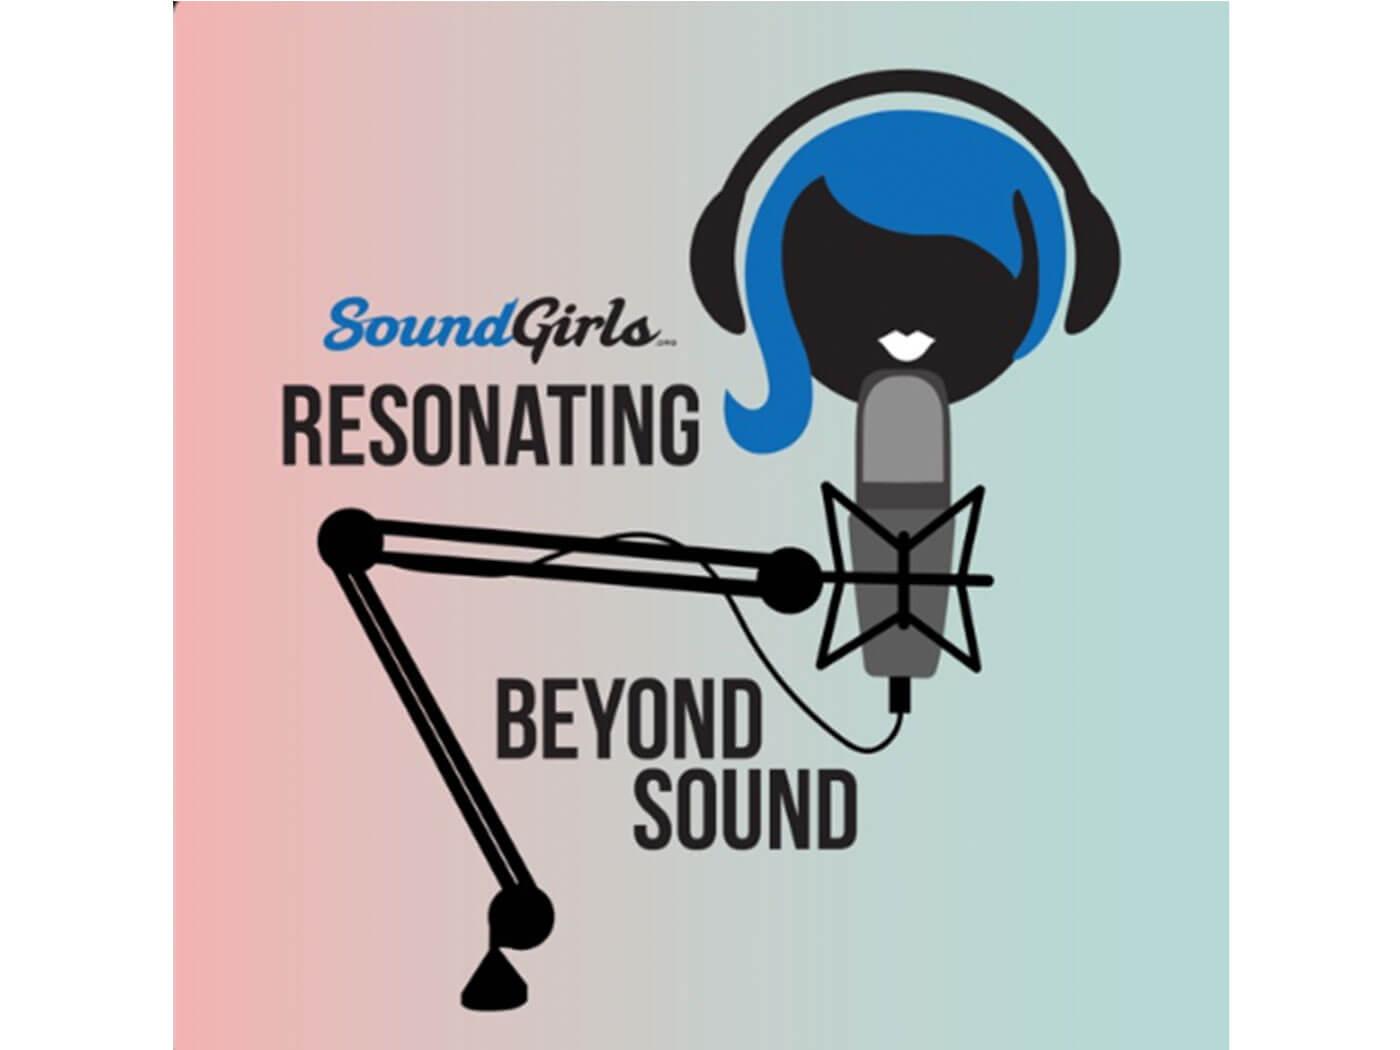 SoundGirls Resonating Beyond Sound